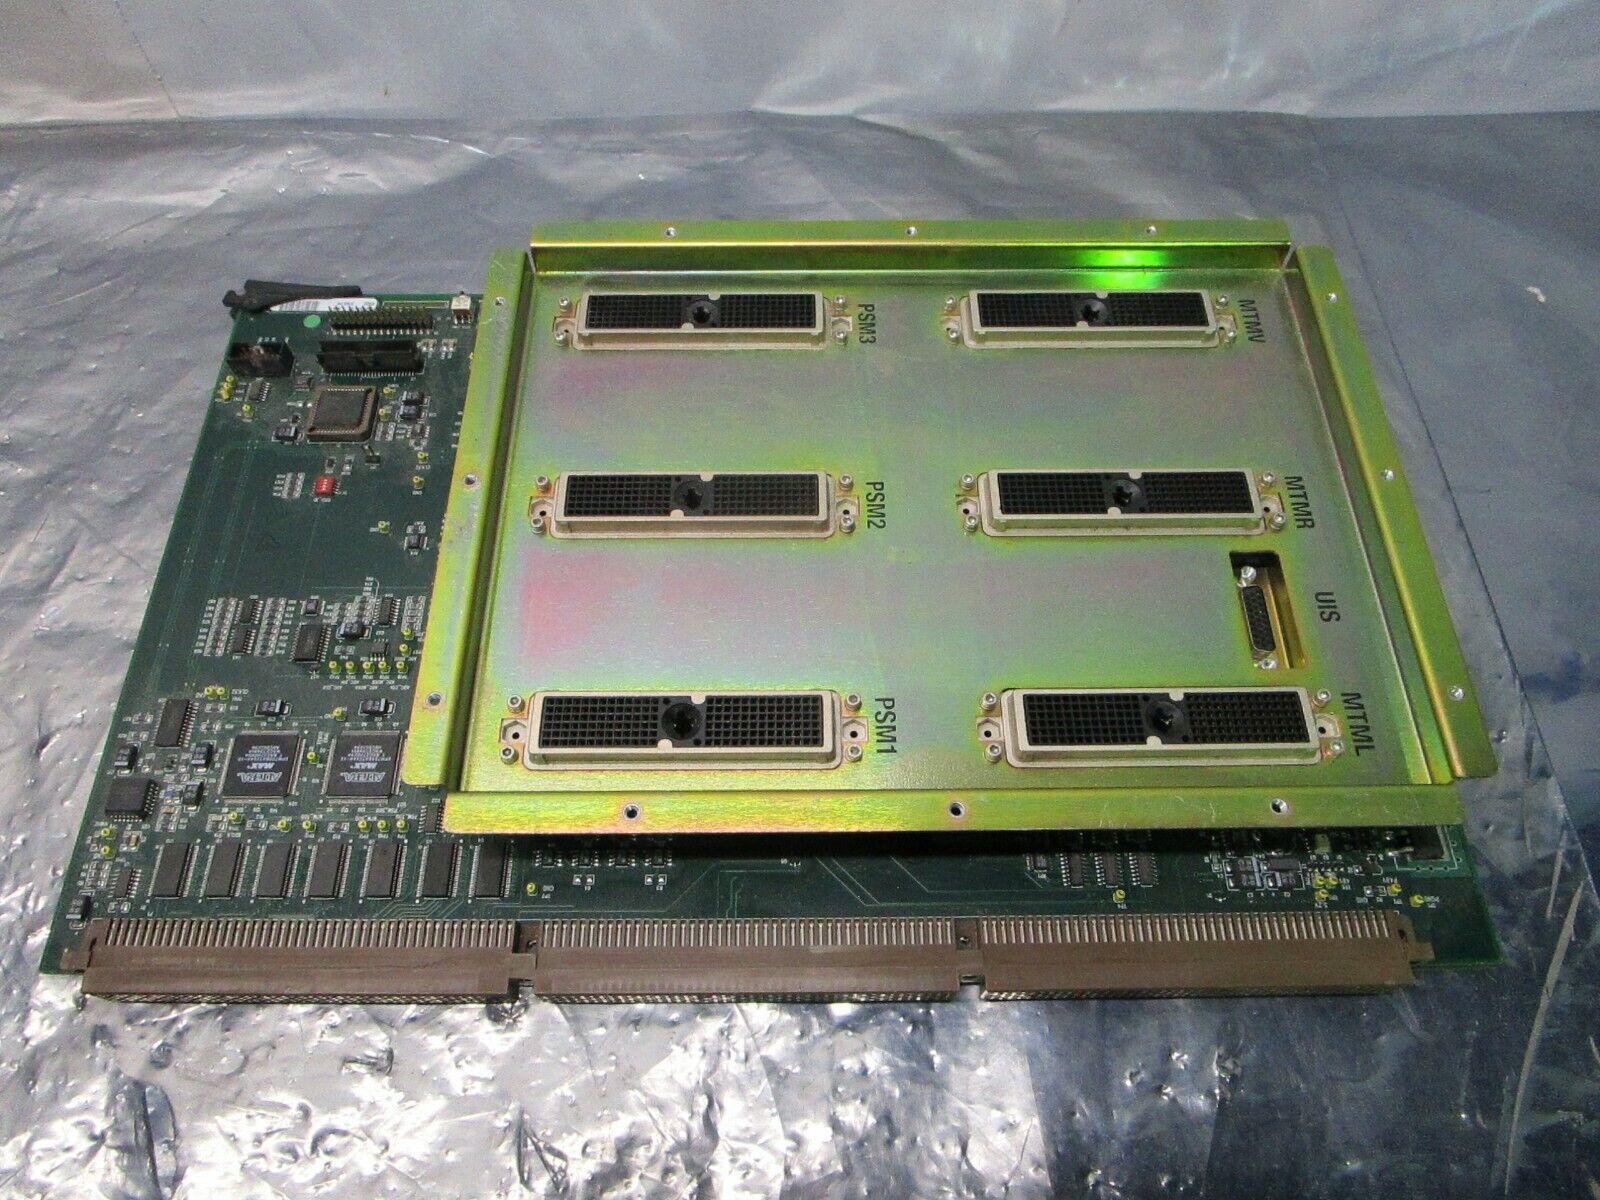 I.S.I. 350400-03 Board, PCB, 350405-01, 101260